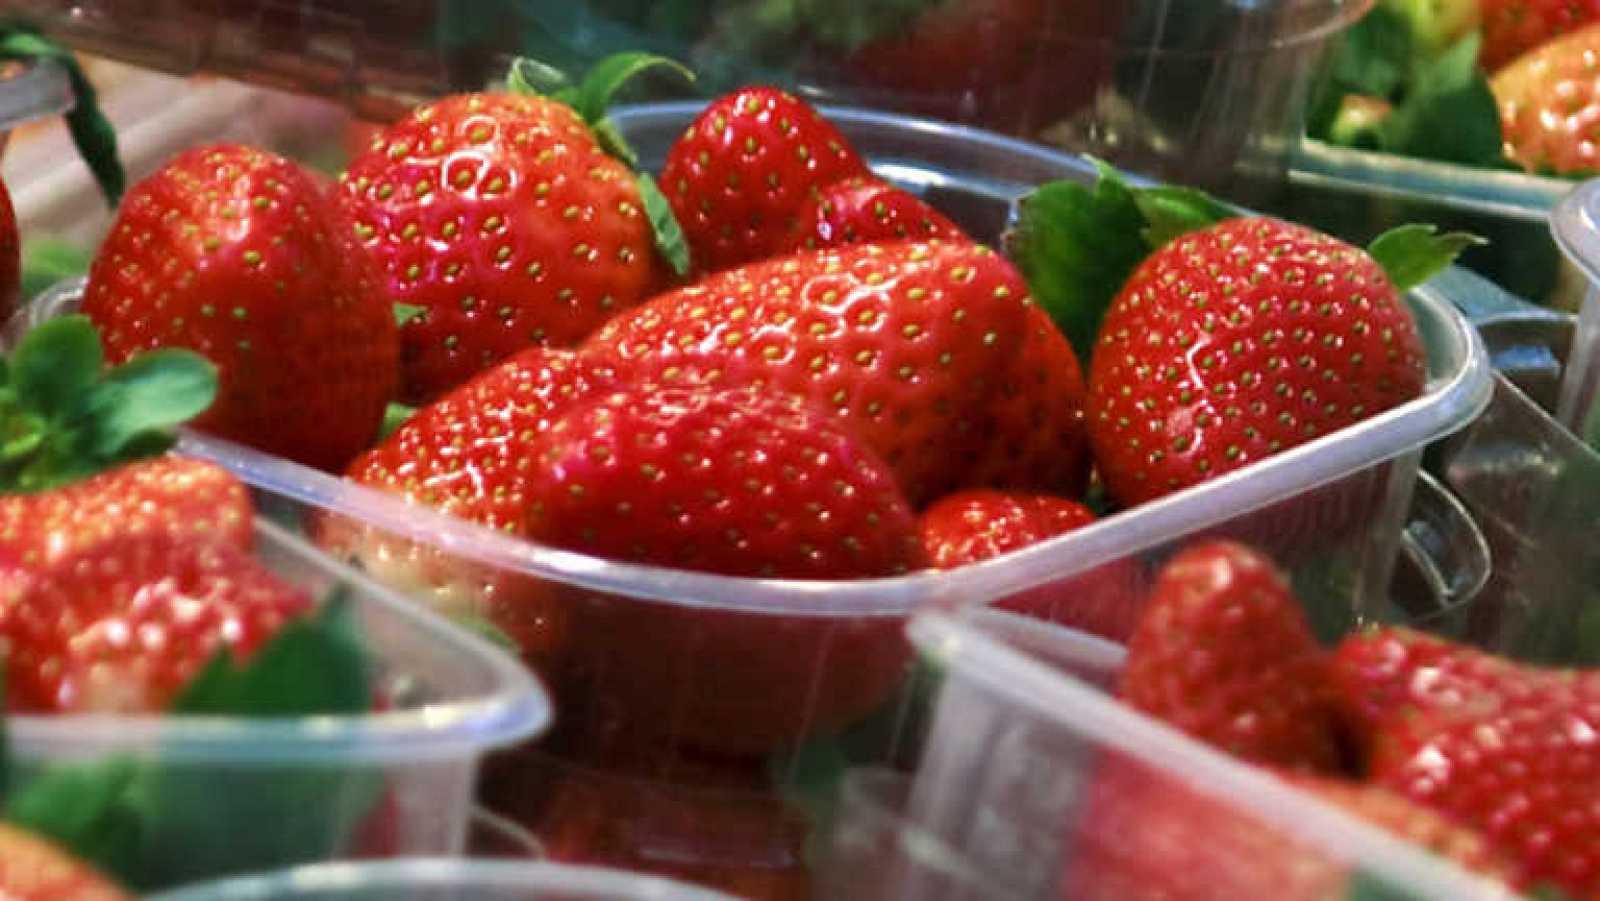 Un país para comérselo - Huelva. Strawberry Fields y un poquito de jamón - ver ahora